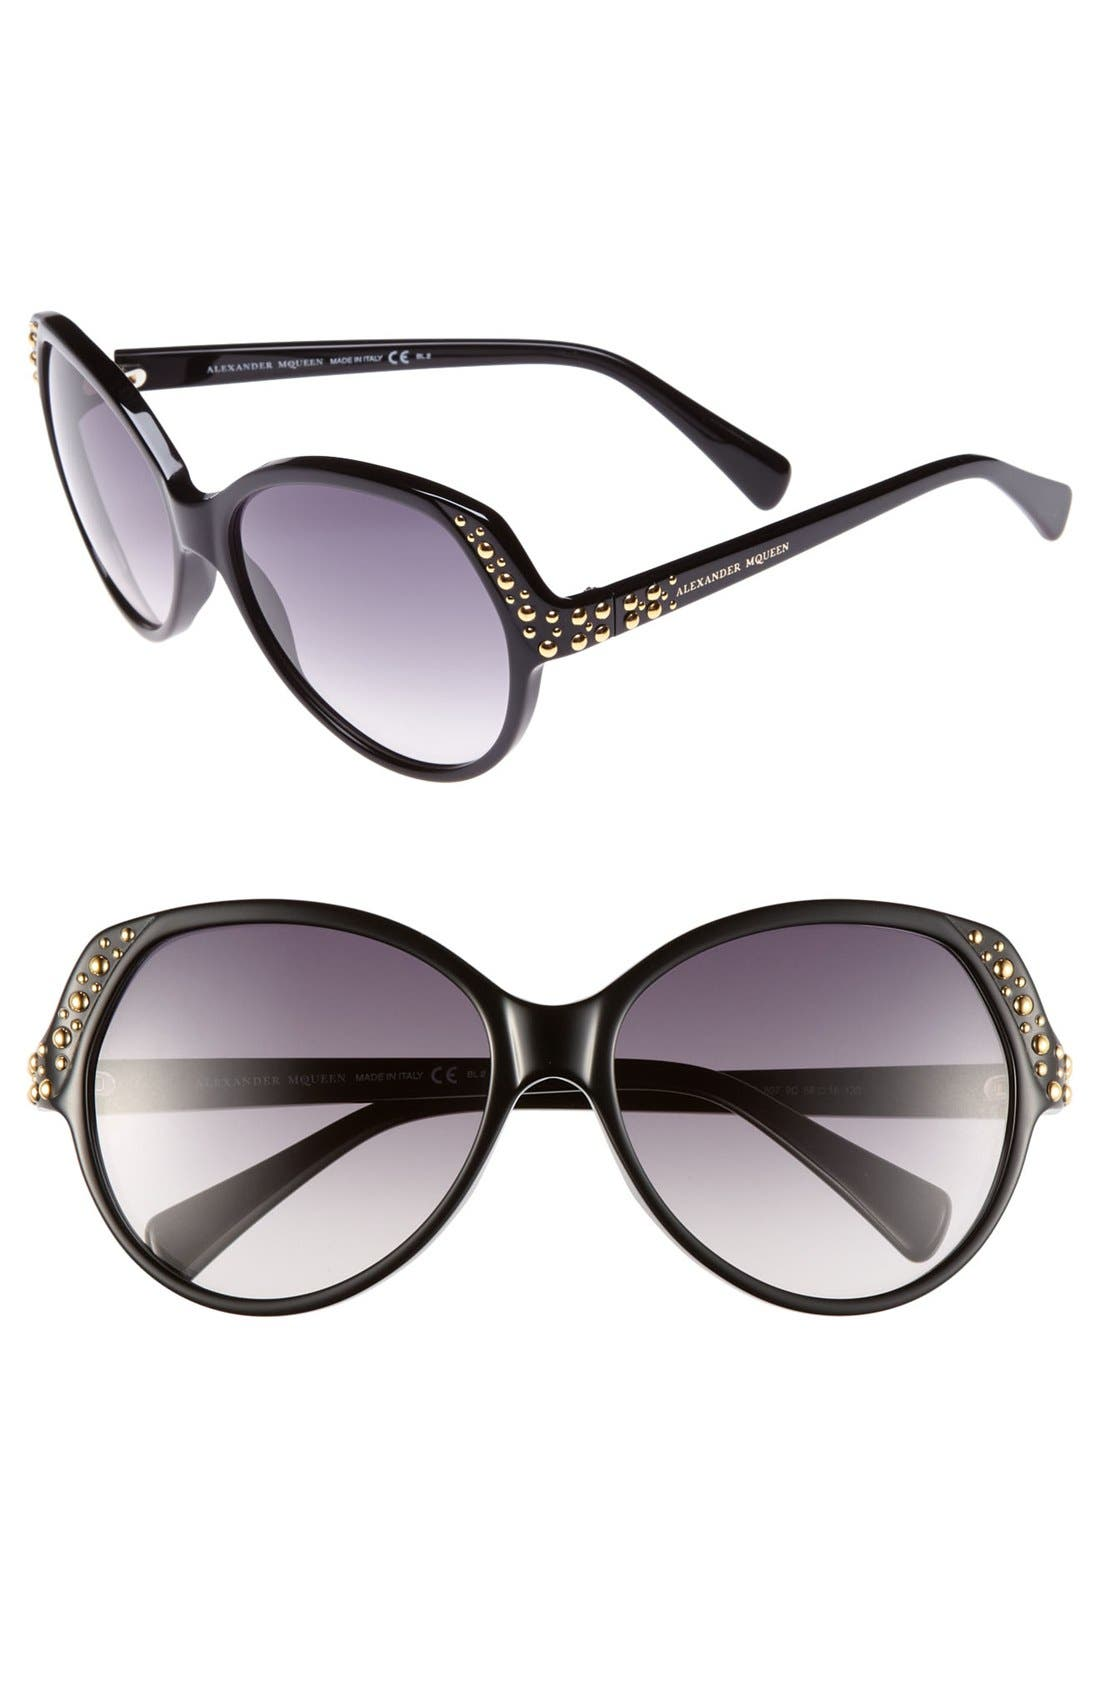 Main Image - Alexander McQueen 58mm Studded Sunglasses